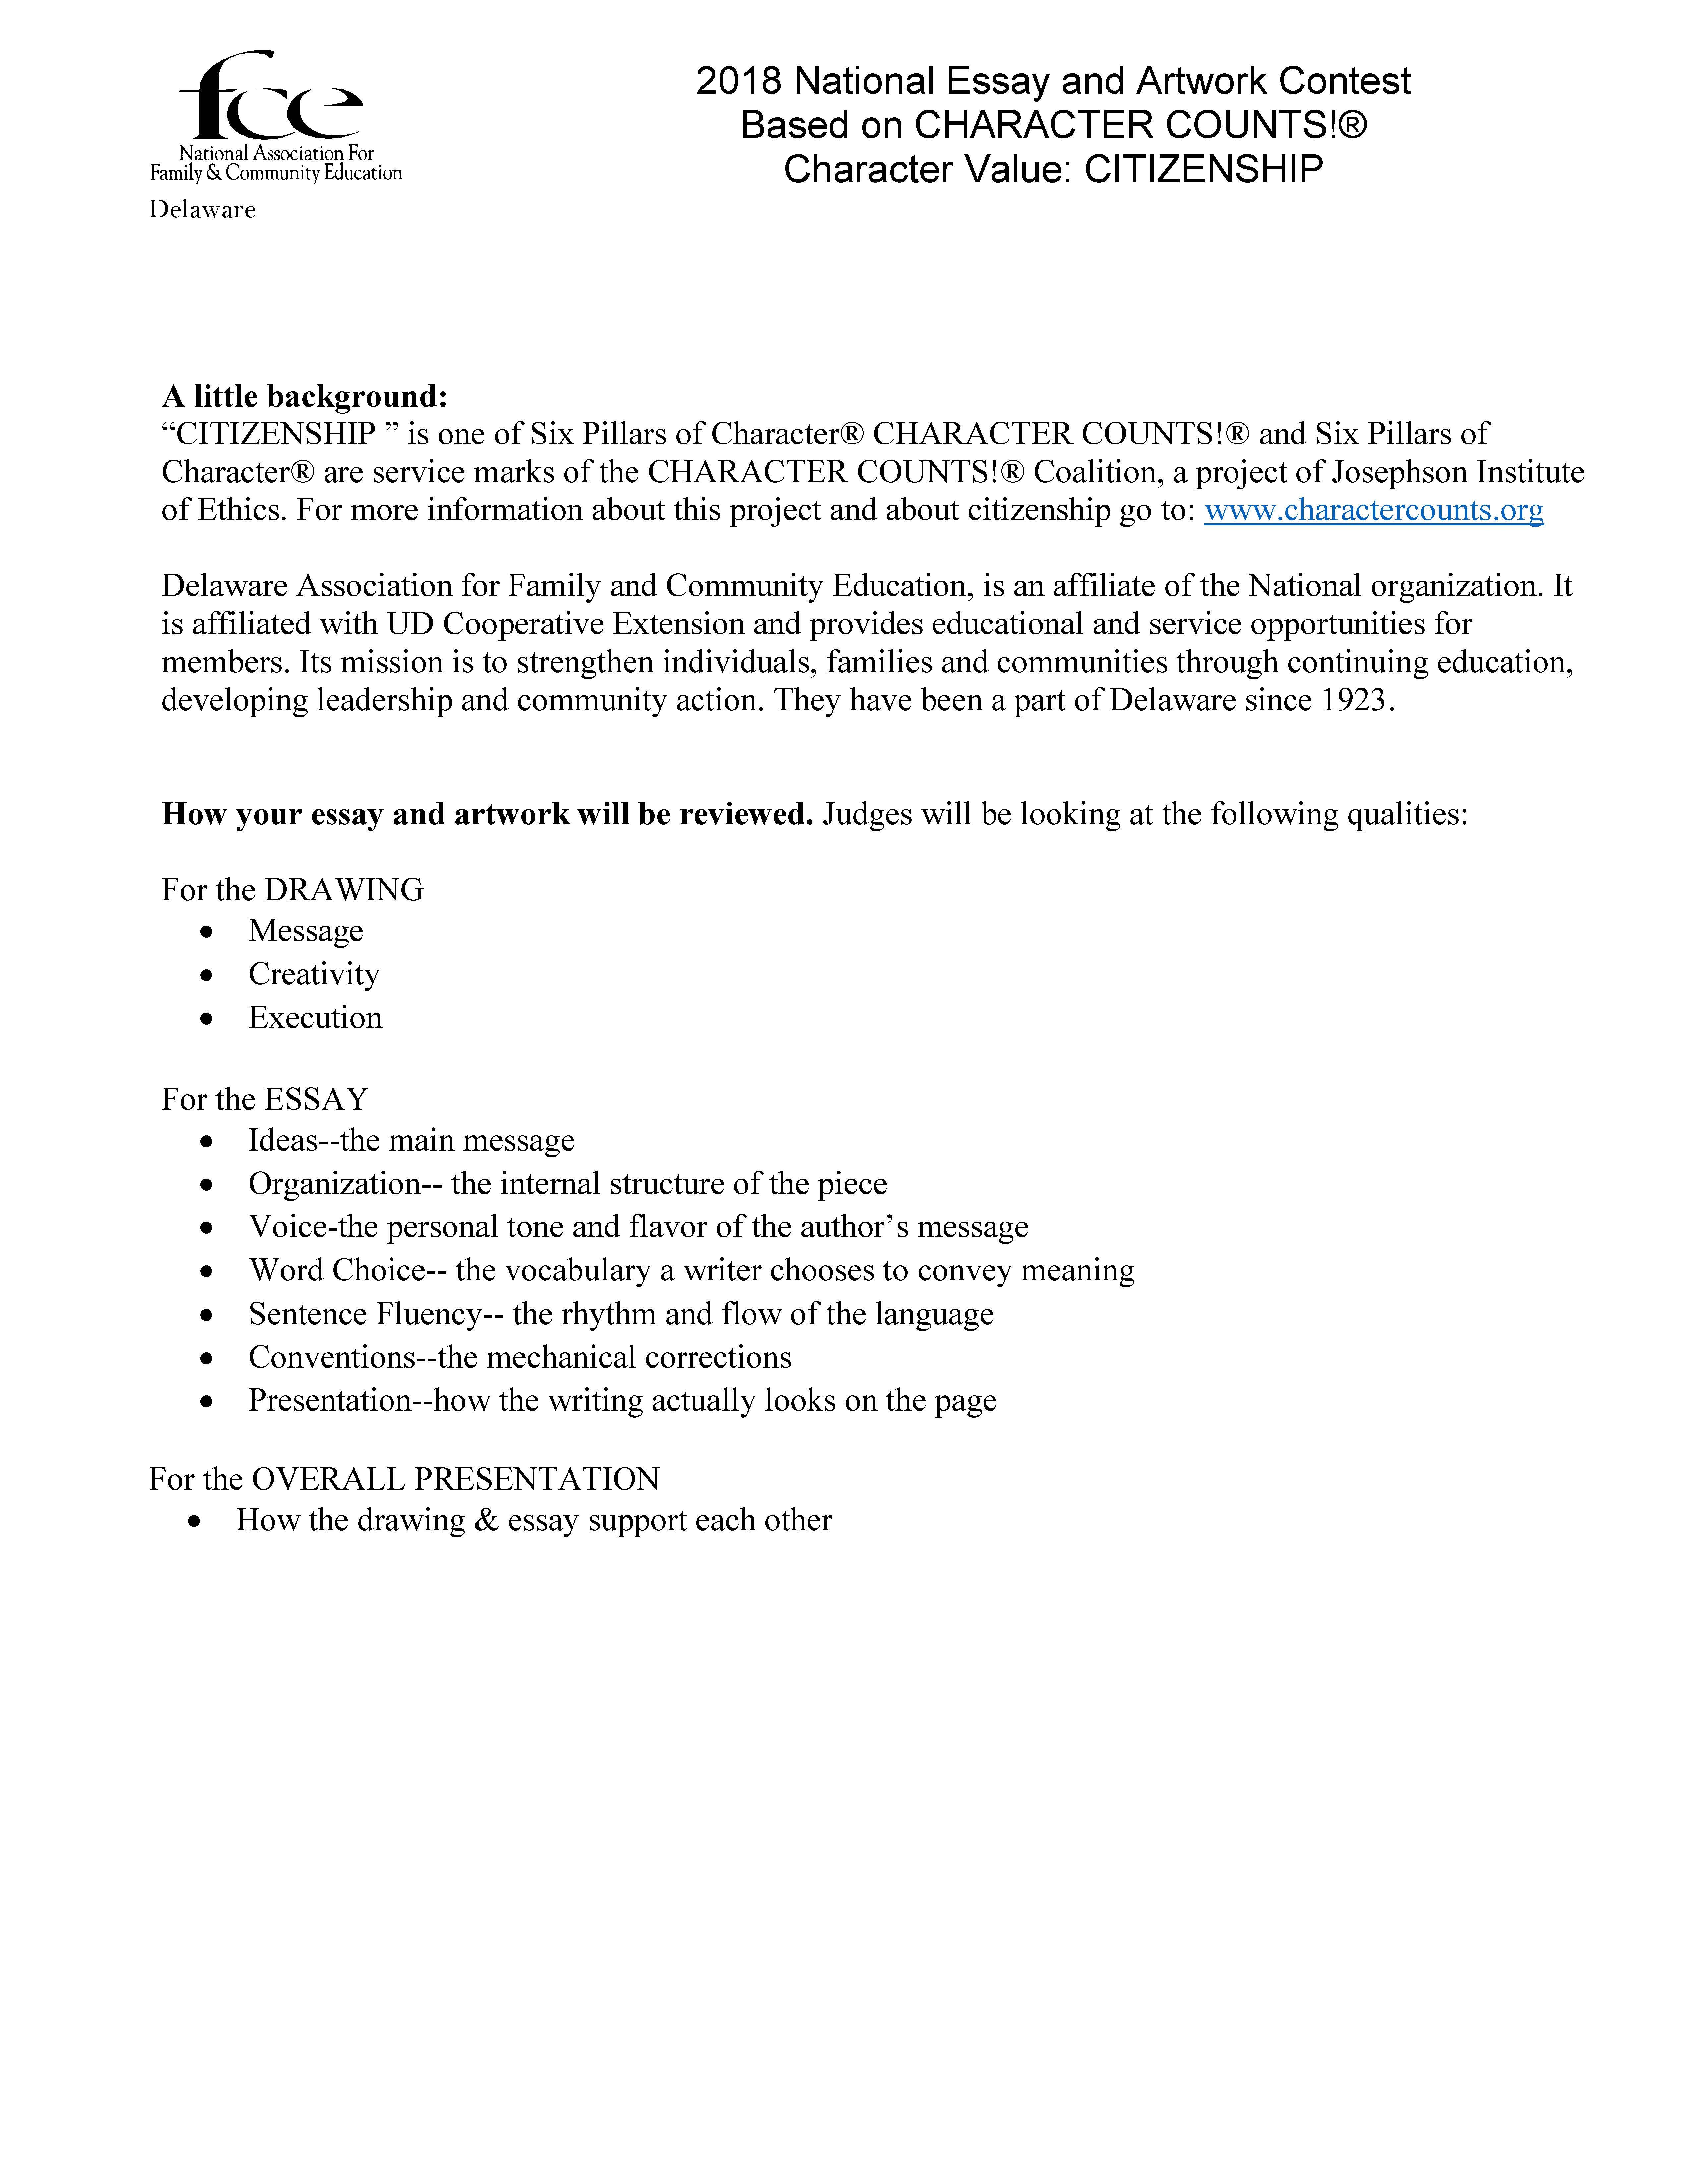 Six Pillars Of Character Essay Six Pillars Of Character Case Study 02 08